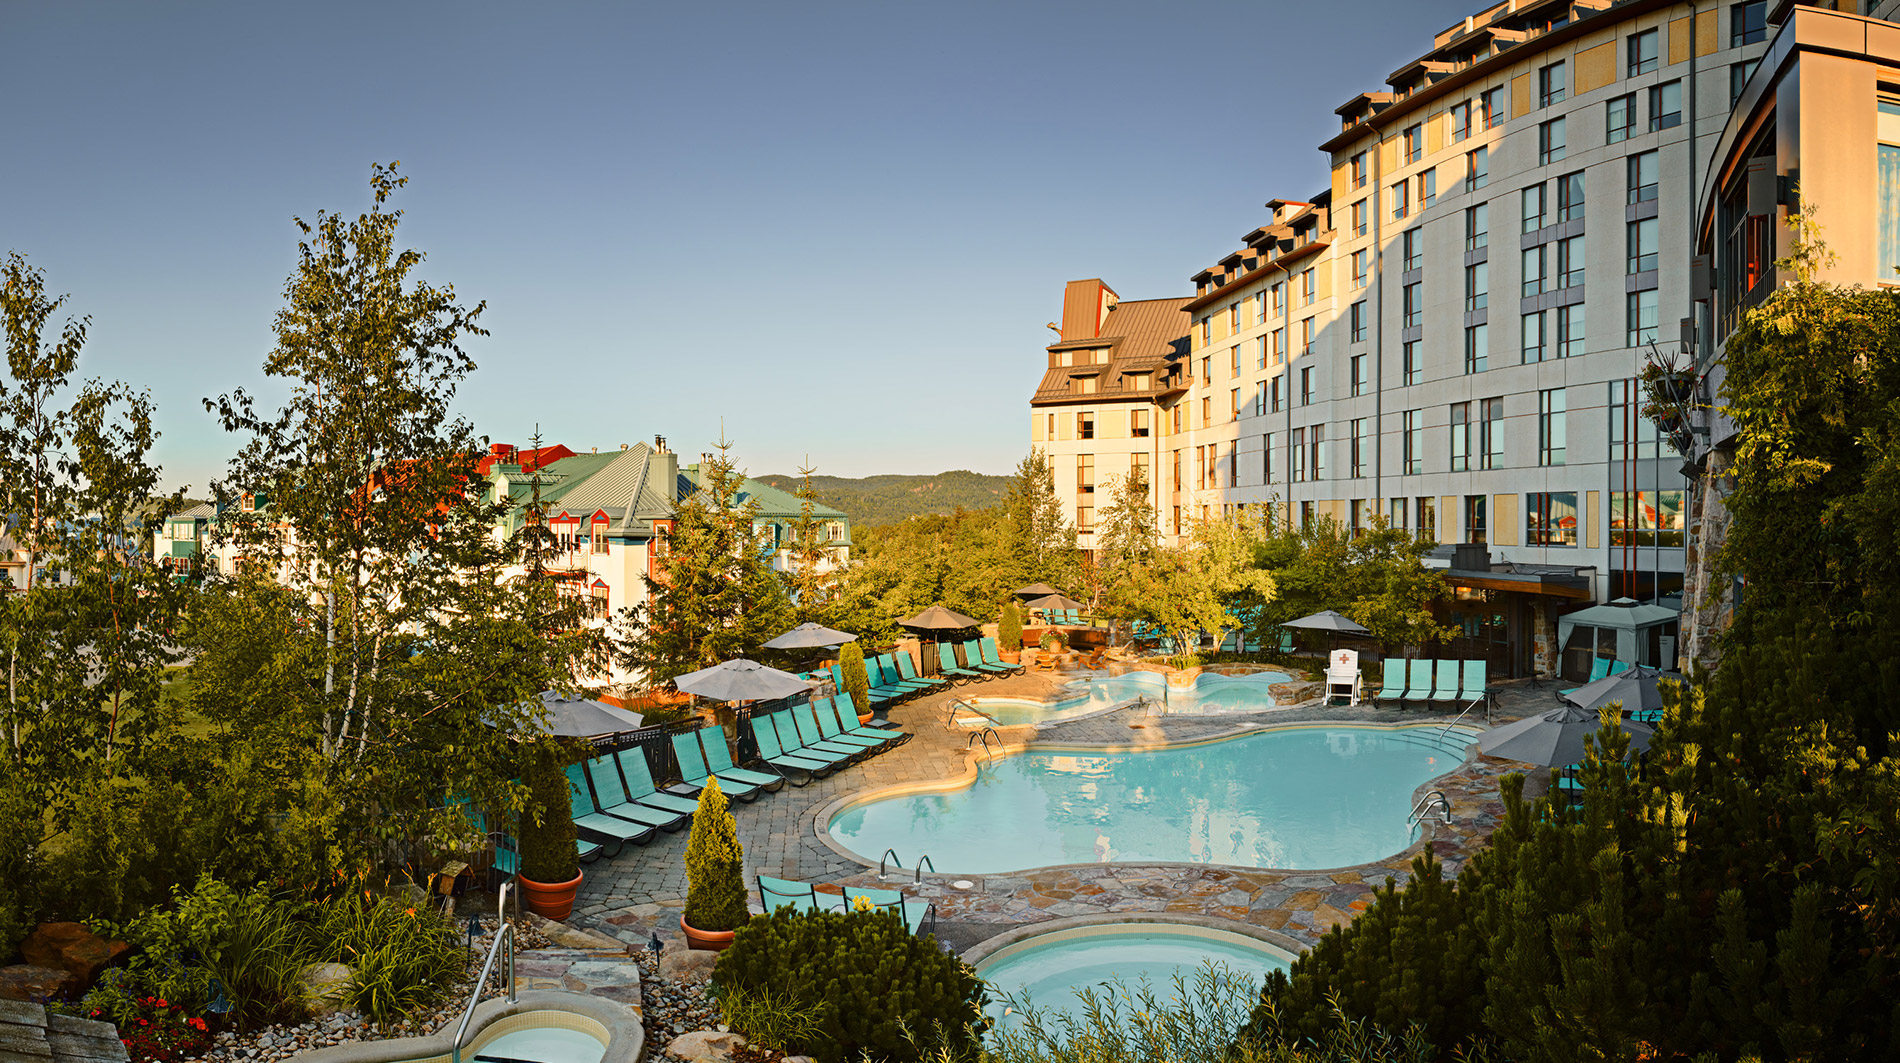 Fairmont-Tremblant-summer-pool-panoramic.jpg